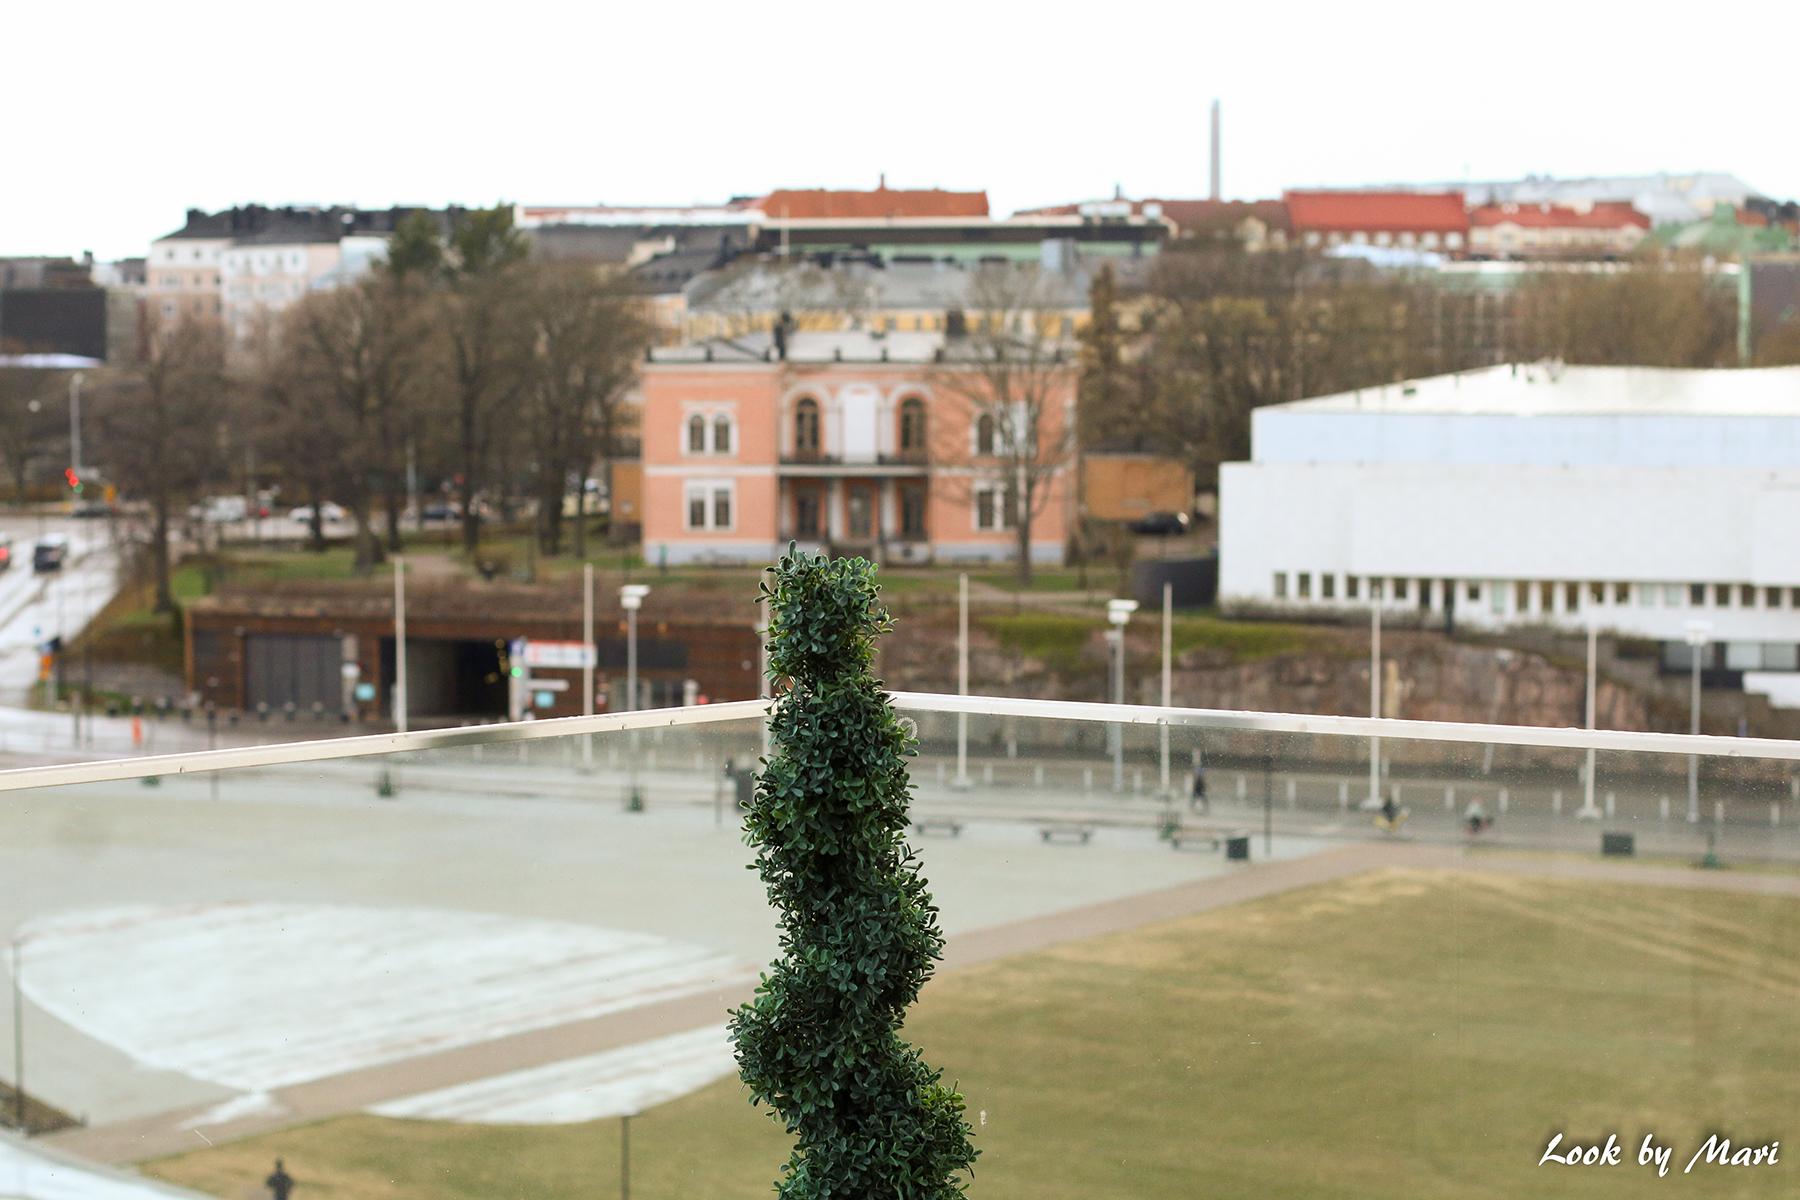 18 glamglow hello sexy event pr tapahtuma finland suomi 2017 successstorypr blogi look by mari